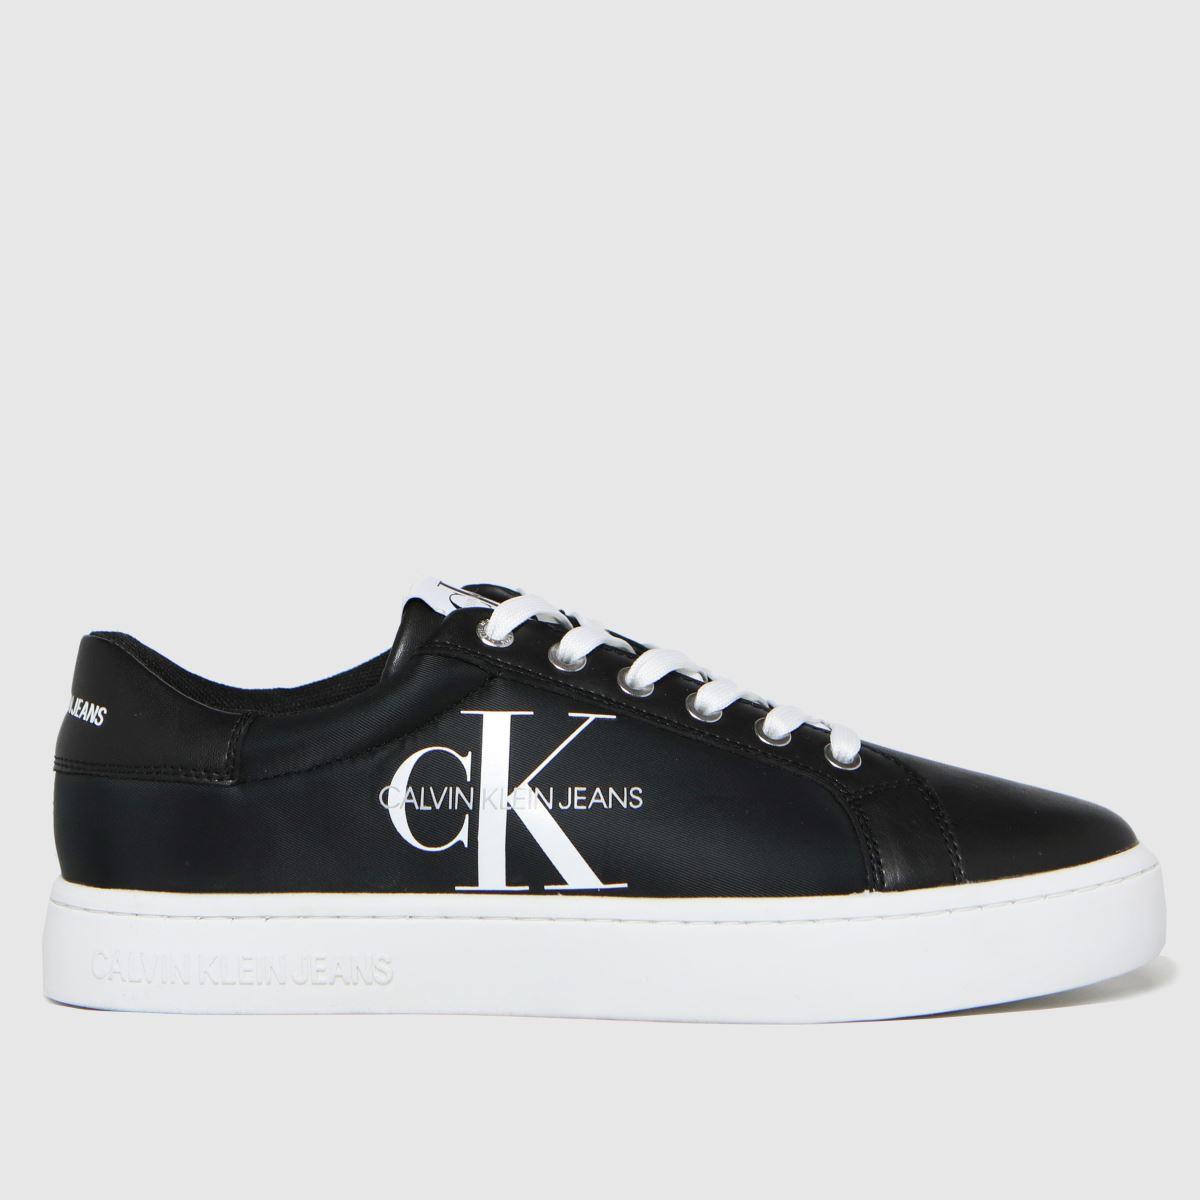 CALVIN KLEIN Black & White Cupsole Sneaker Trainers